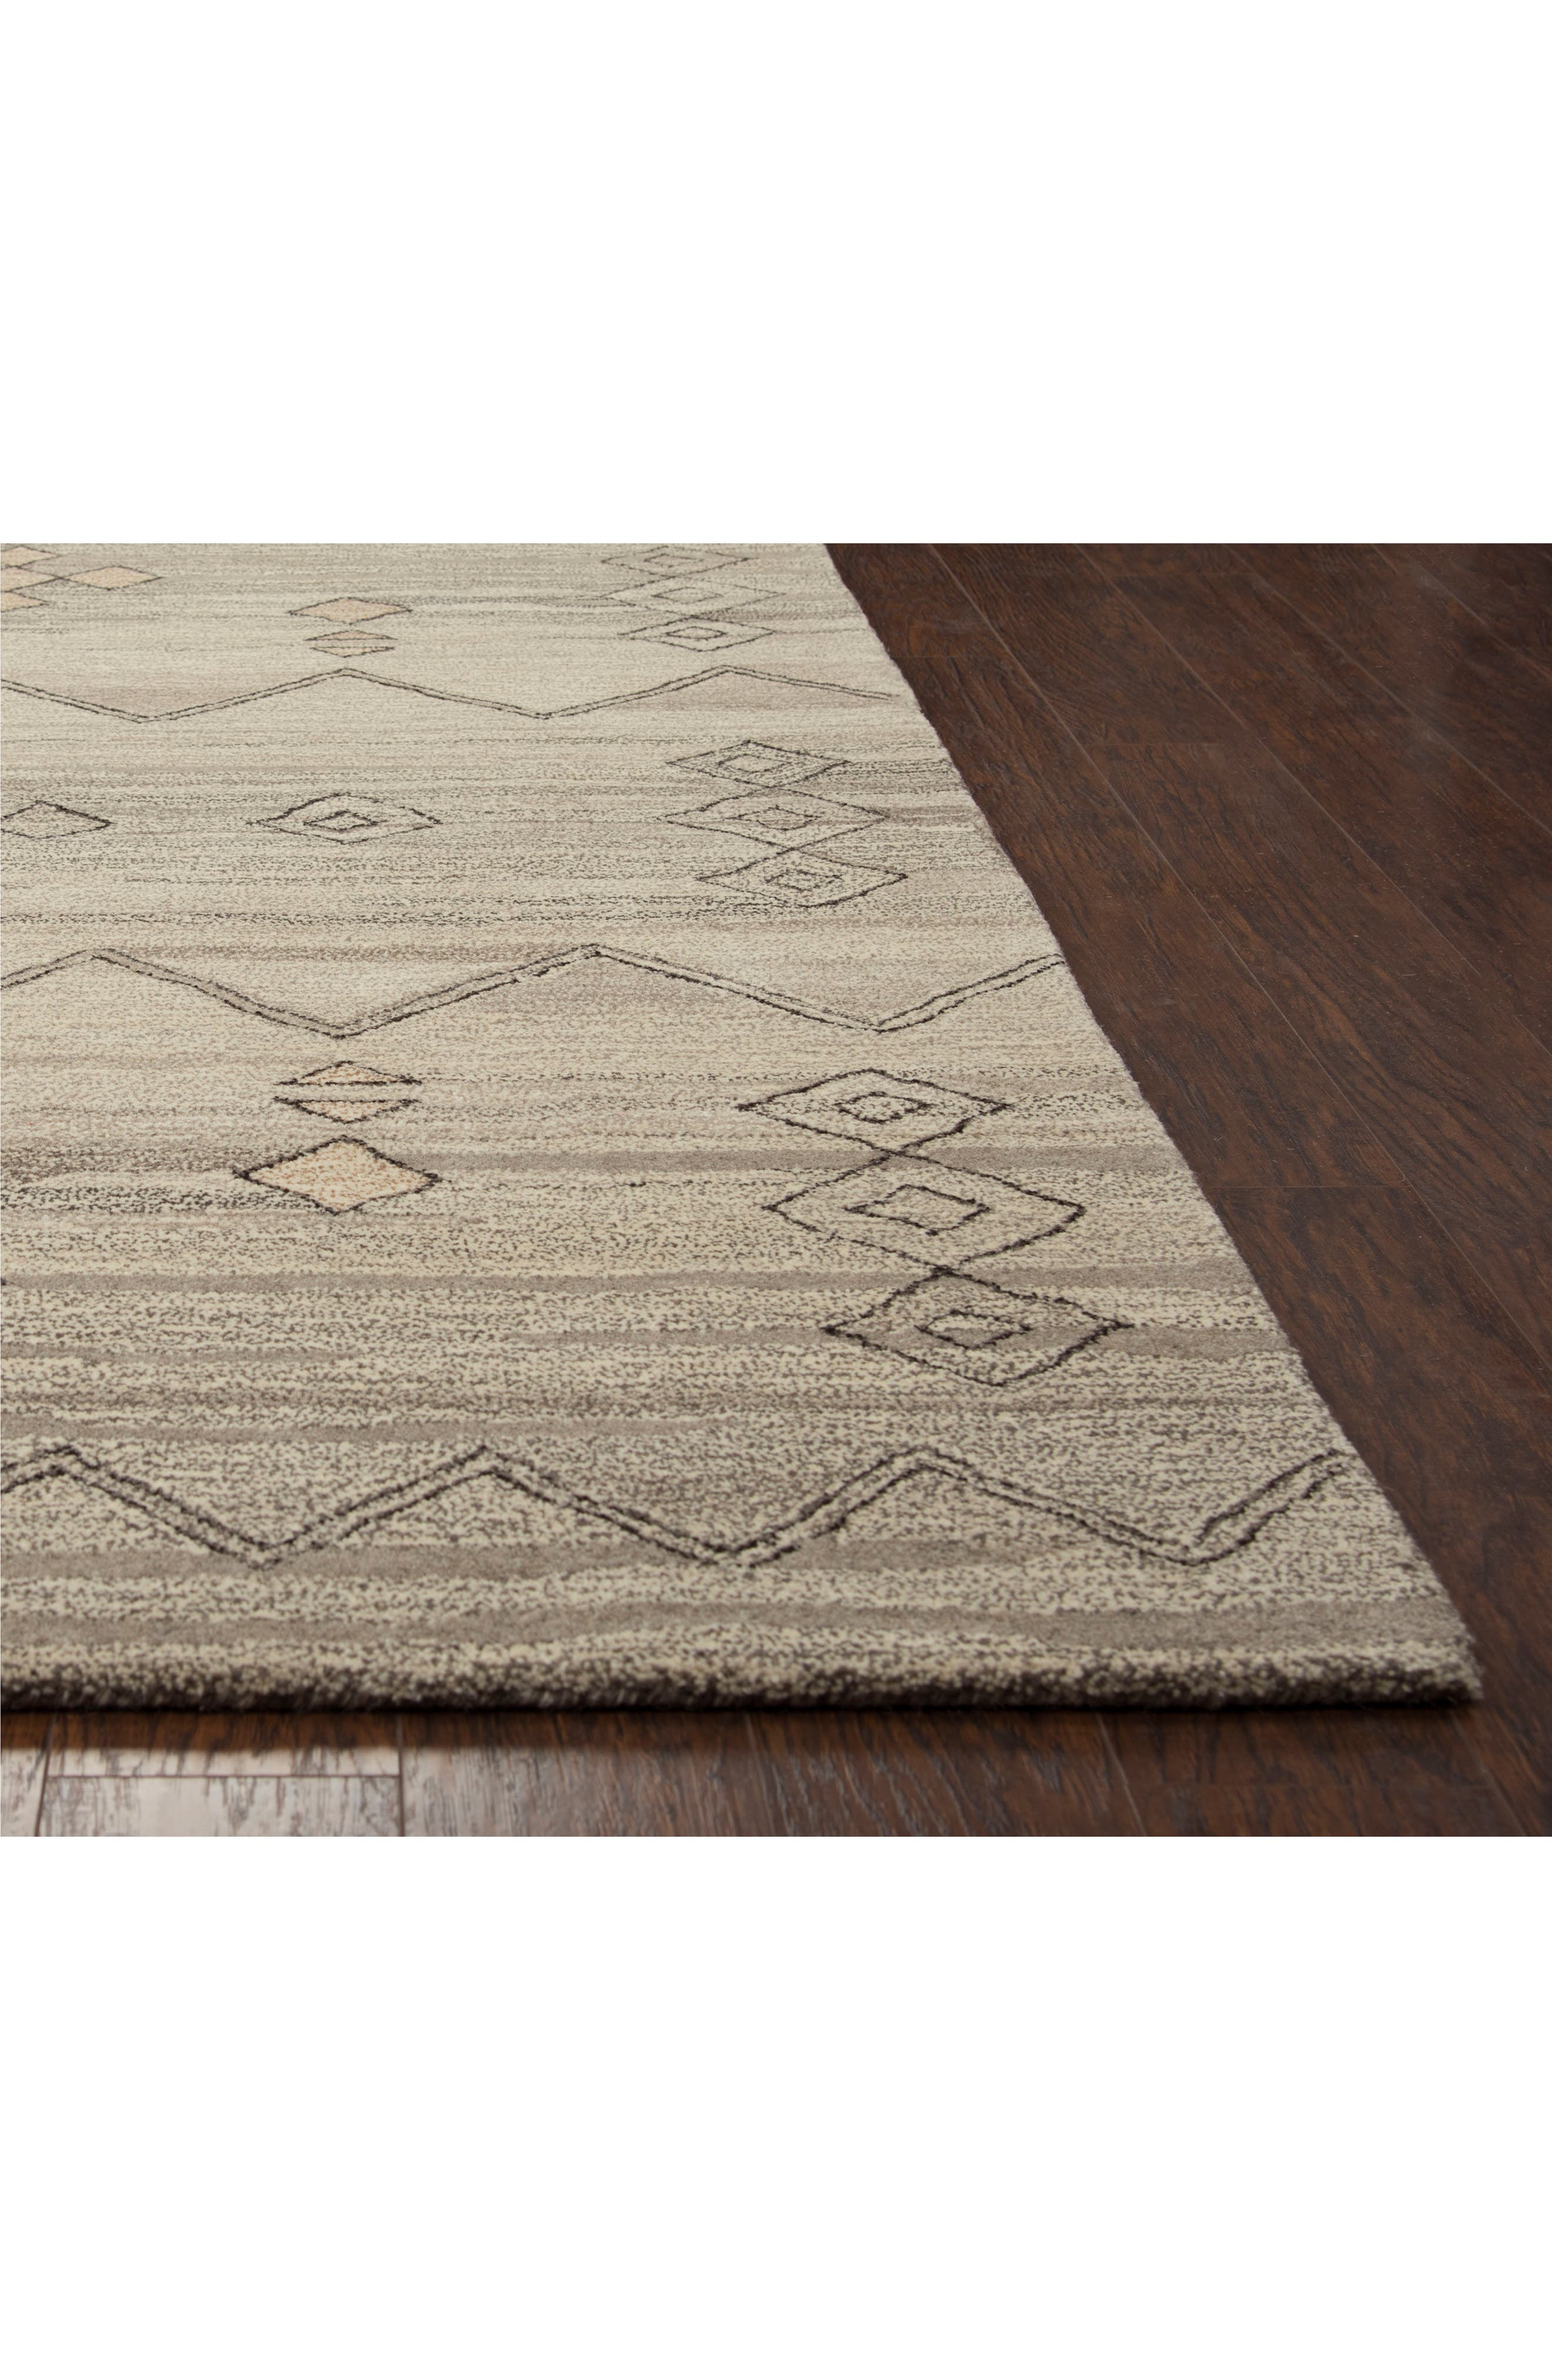 Desert Plains Hand Tufted Wool Area Rug,                             Alternate thumbnail 4, color,                             020